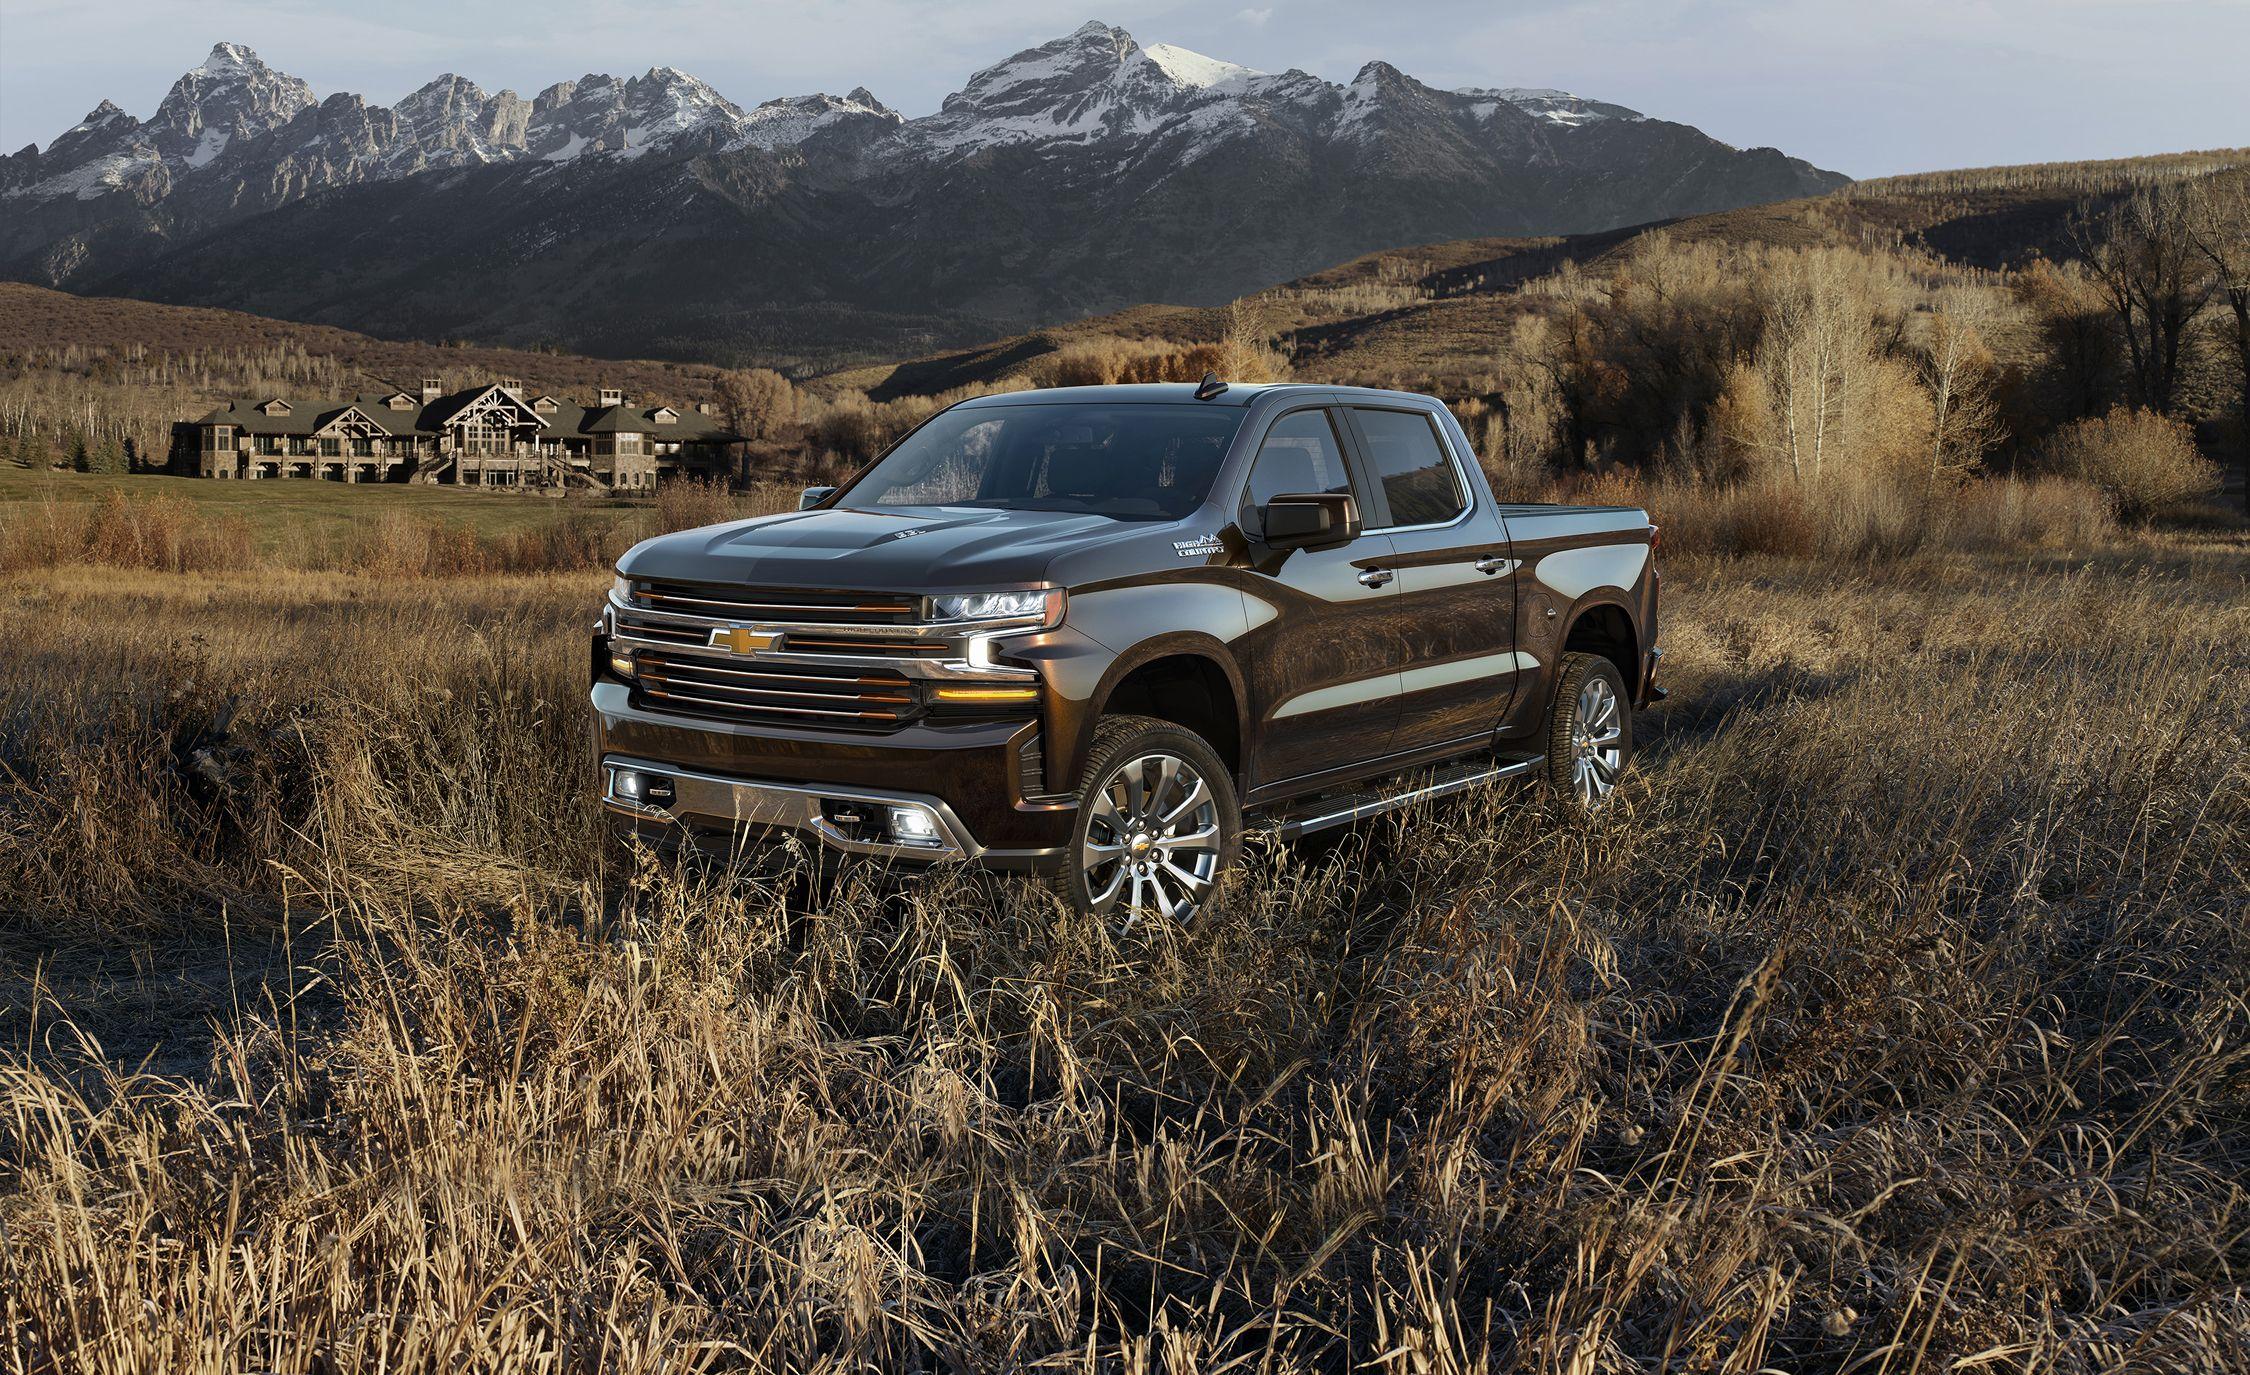 Chevrolet Silverado 1500 Reviews | Chevrolet Silverado ...